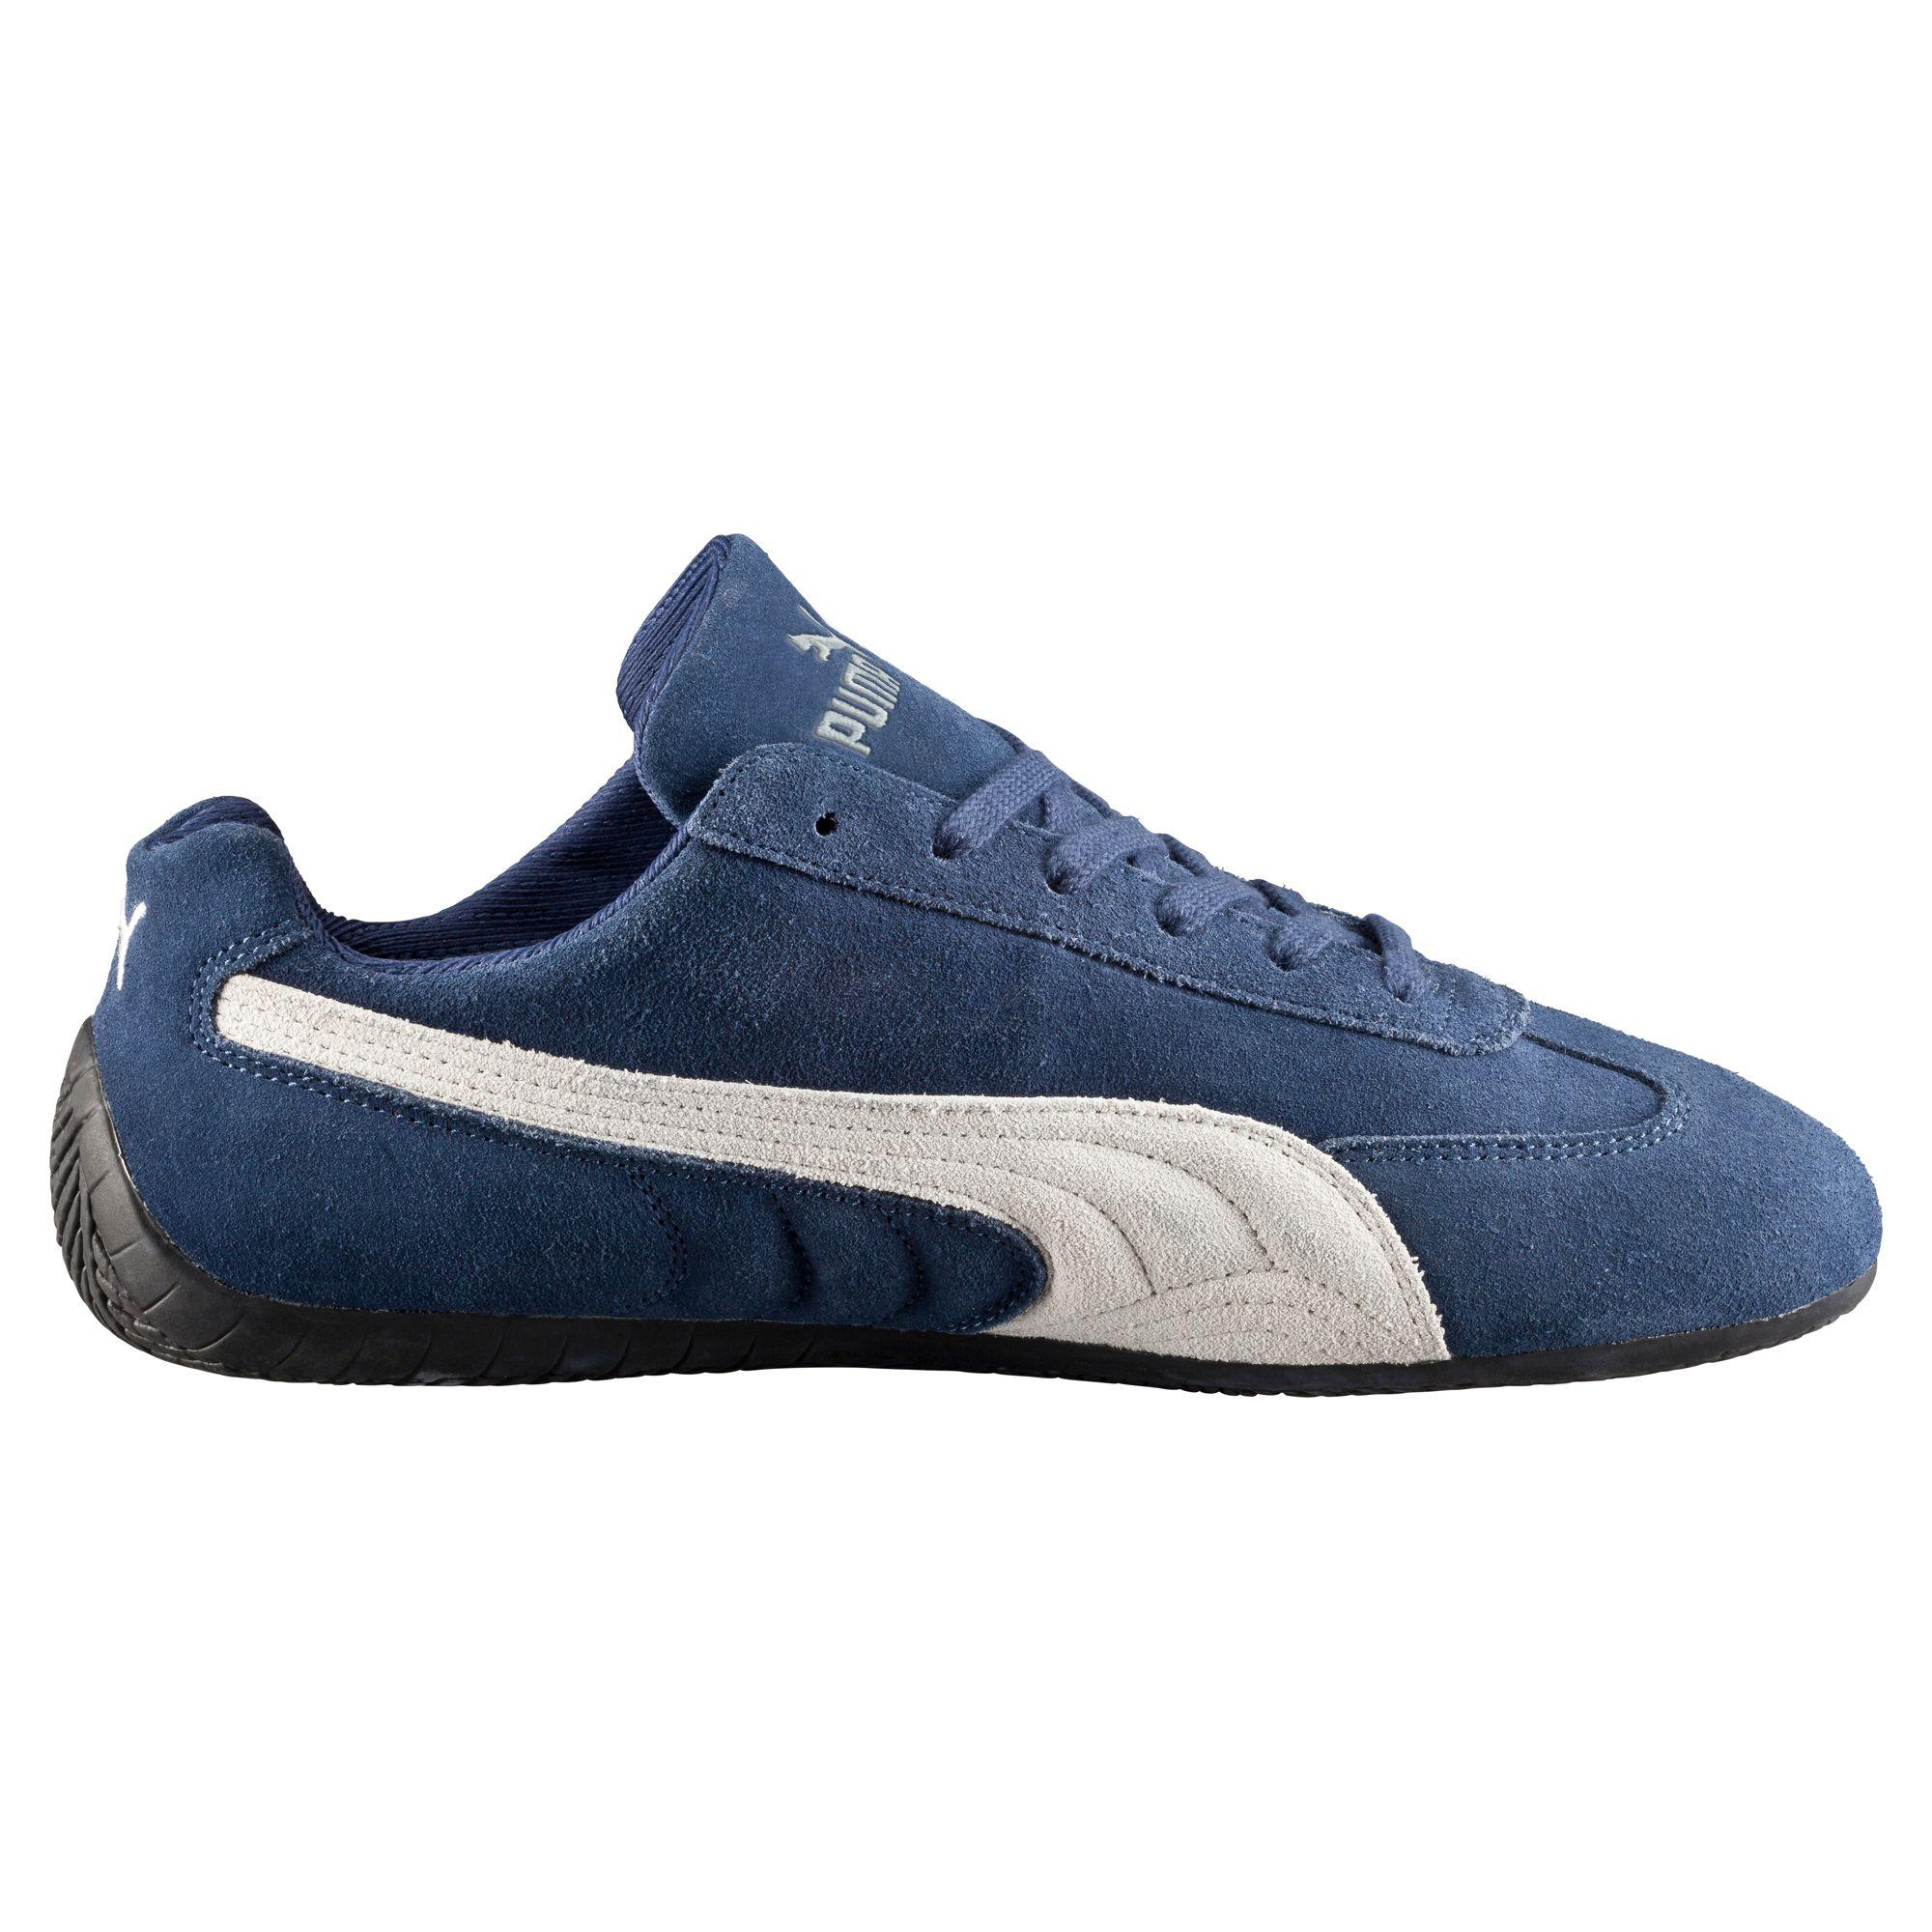 puma sale shoes, Puma speed cat trainers# all black# rare